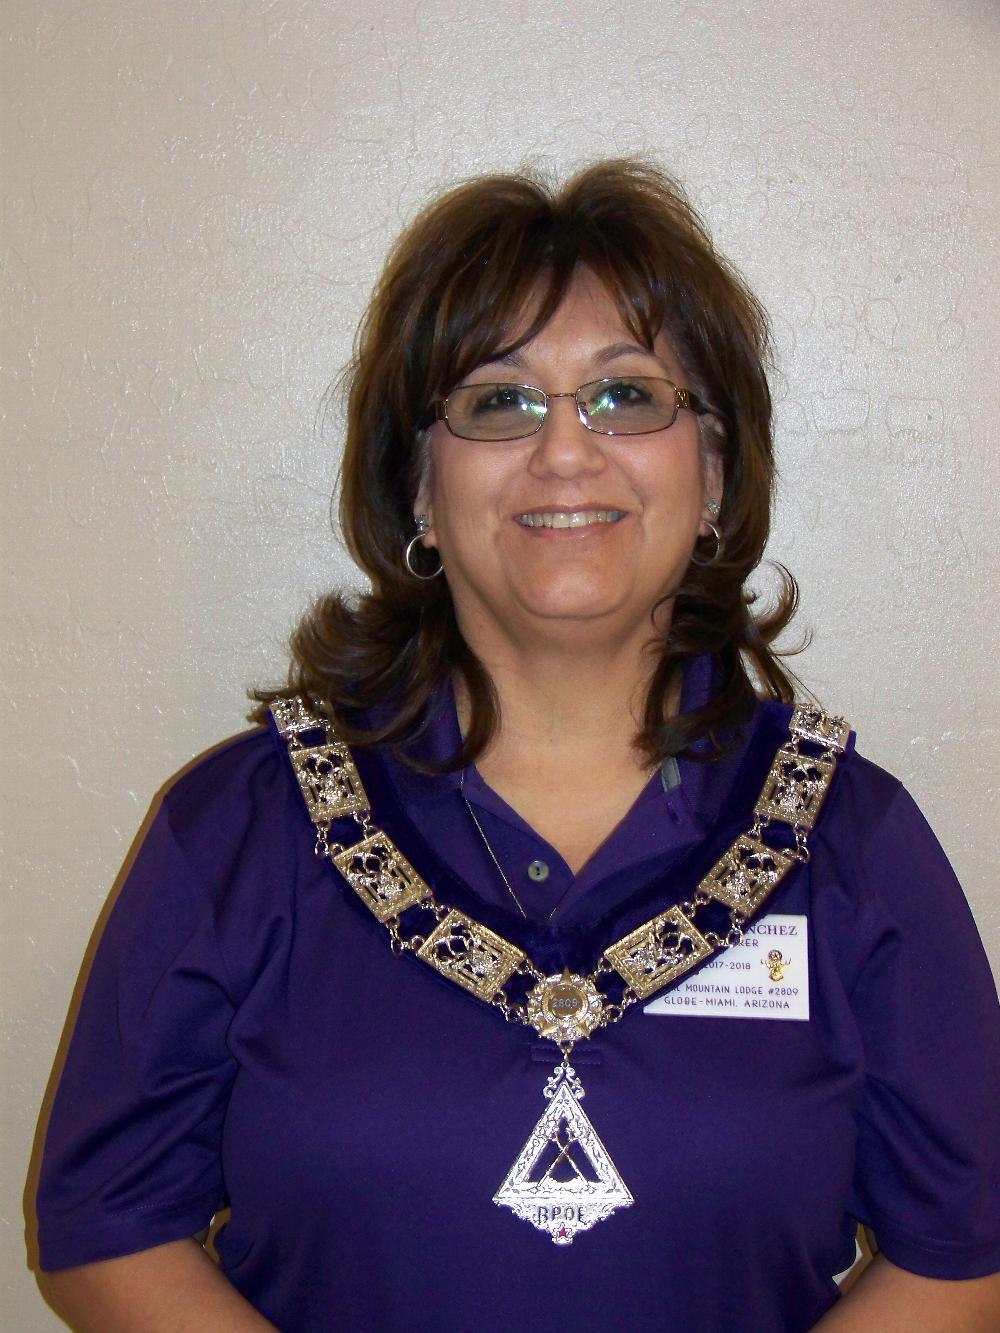 TERESA SANCHEZ TREASURER